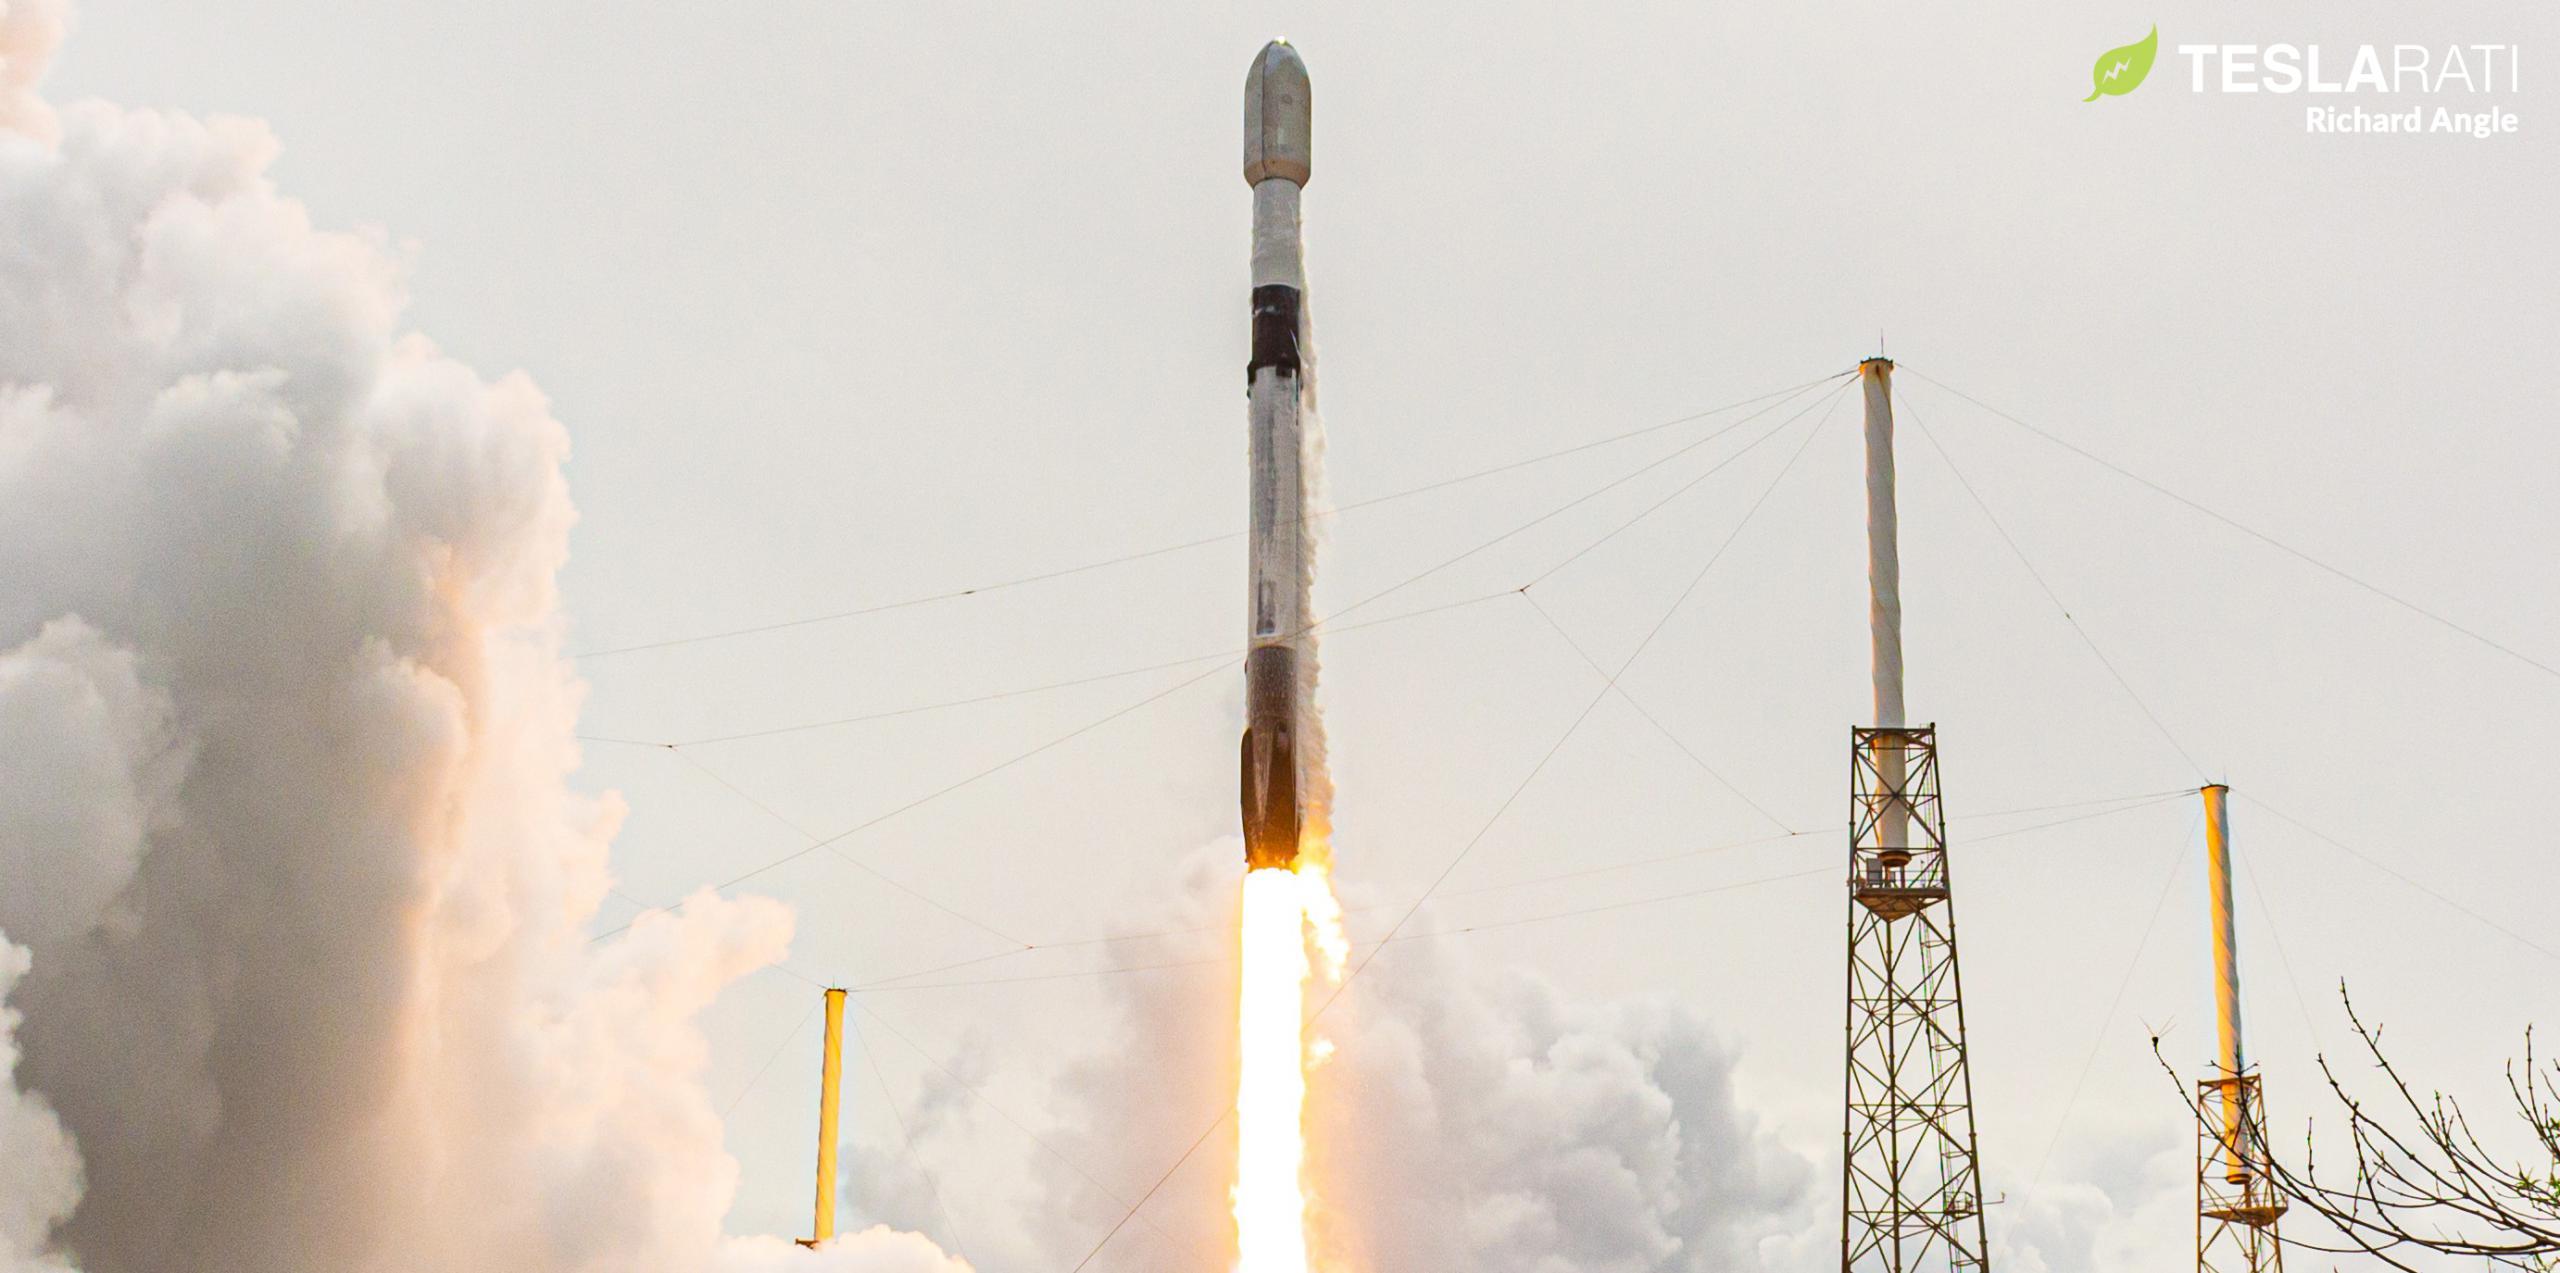 Transporter-2 Falcon 9 B1060 063021 (Richard Angle) launch 2 crop 2 (c)